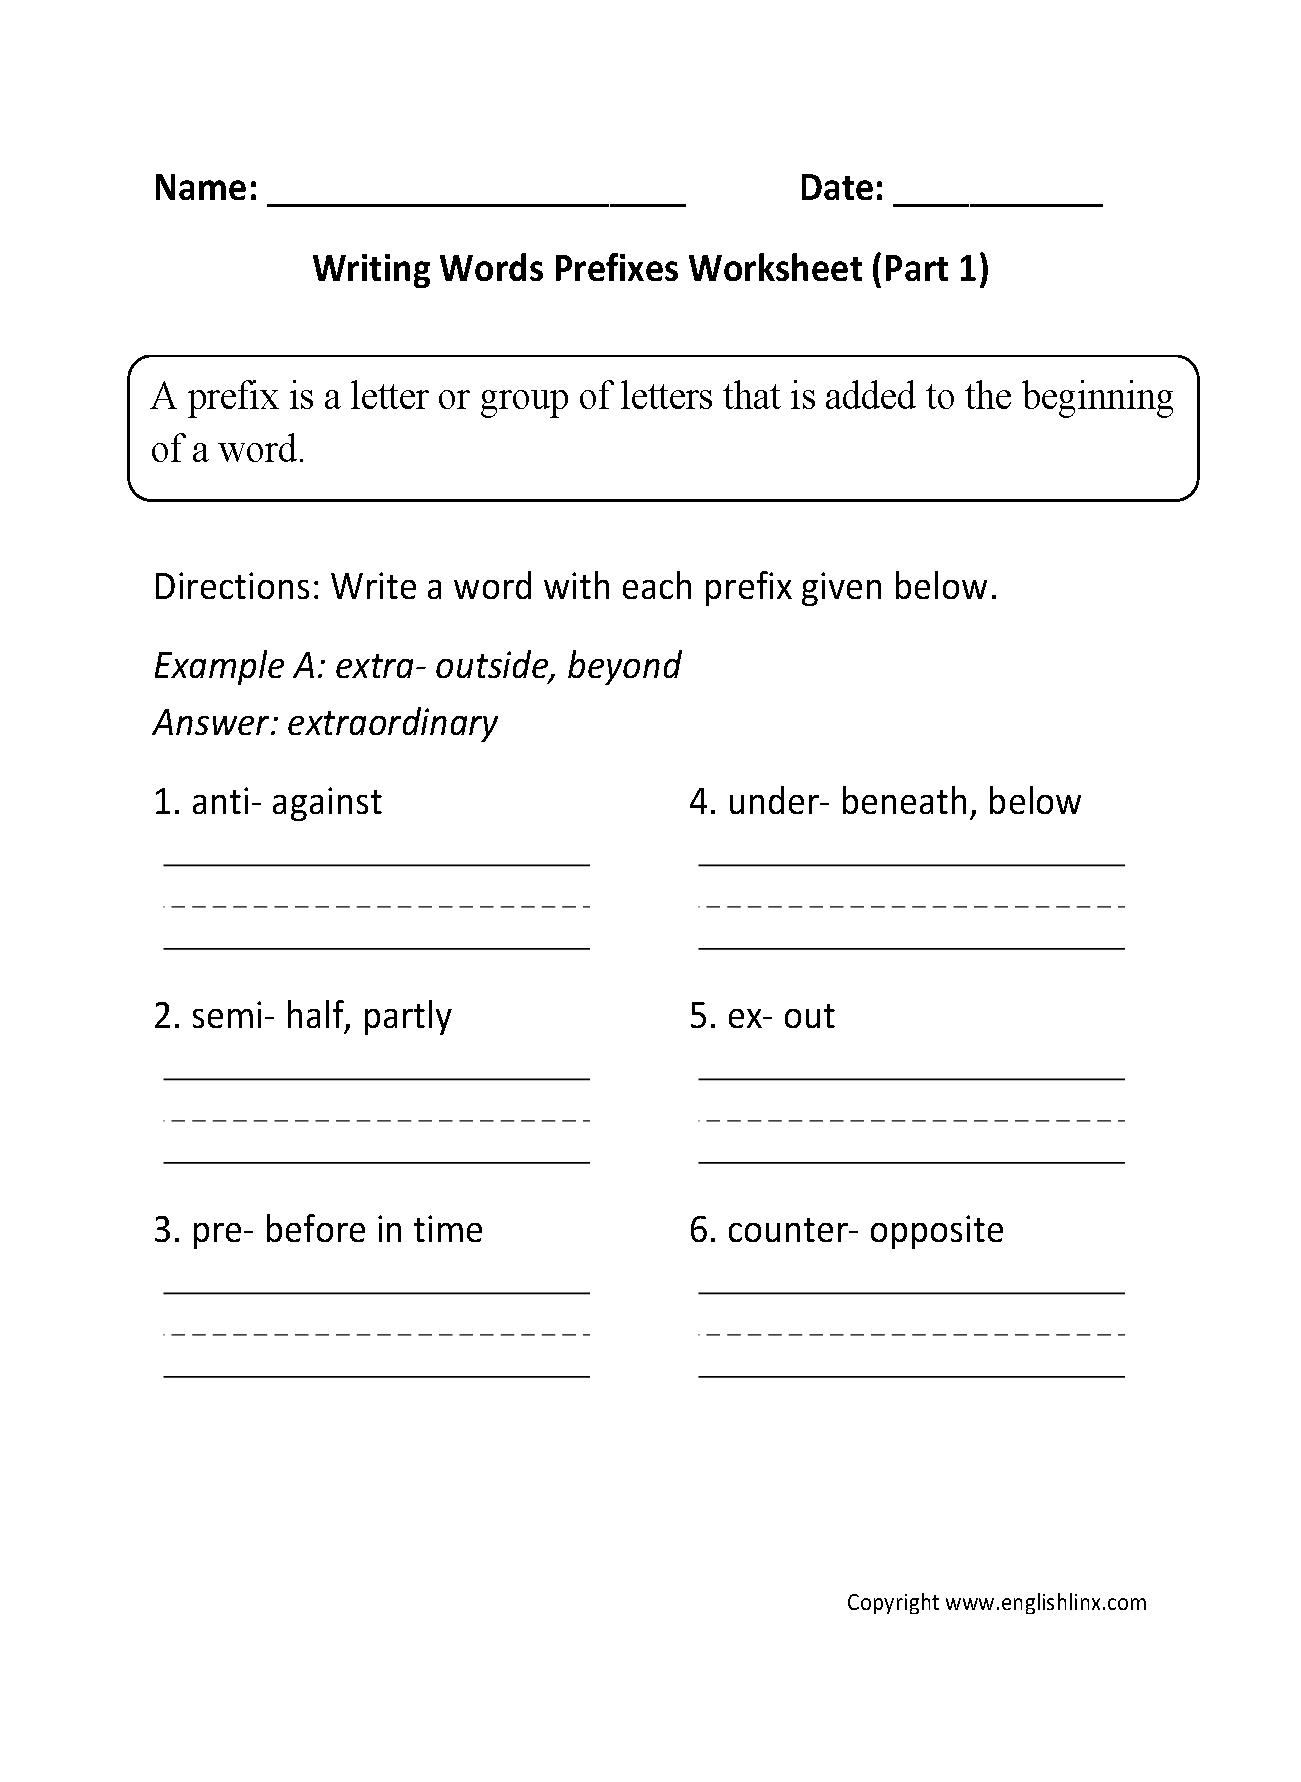 Writing Words Prefixes Worksheet Part 1